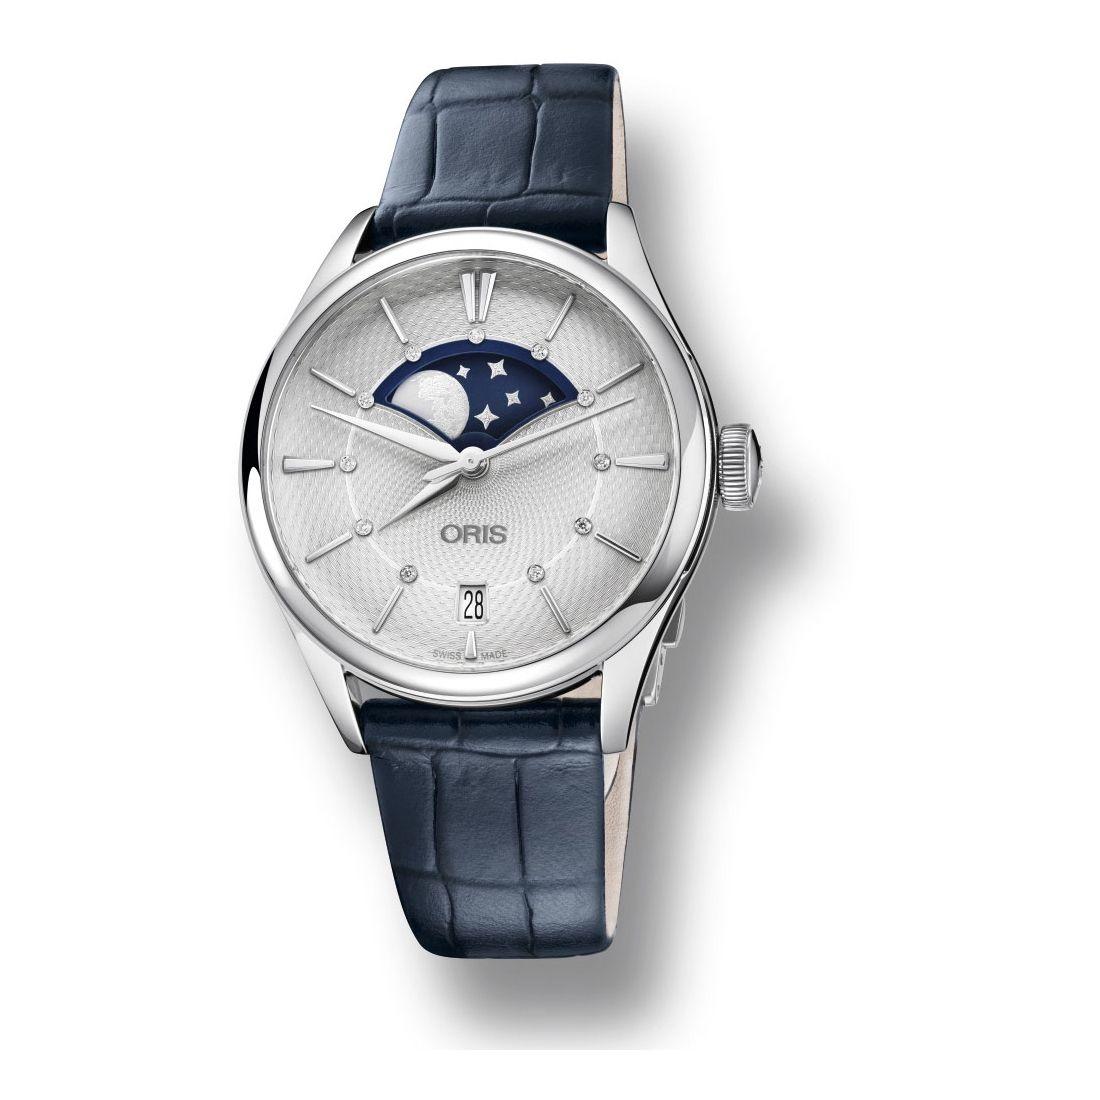 Reloj Oris Artelier Grande Lune Date - 01 763 7723 4051-07 5 18 66FC  - 1